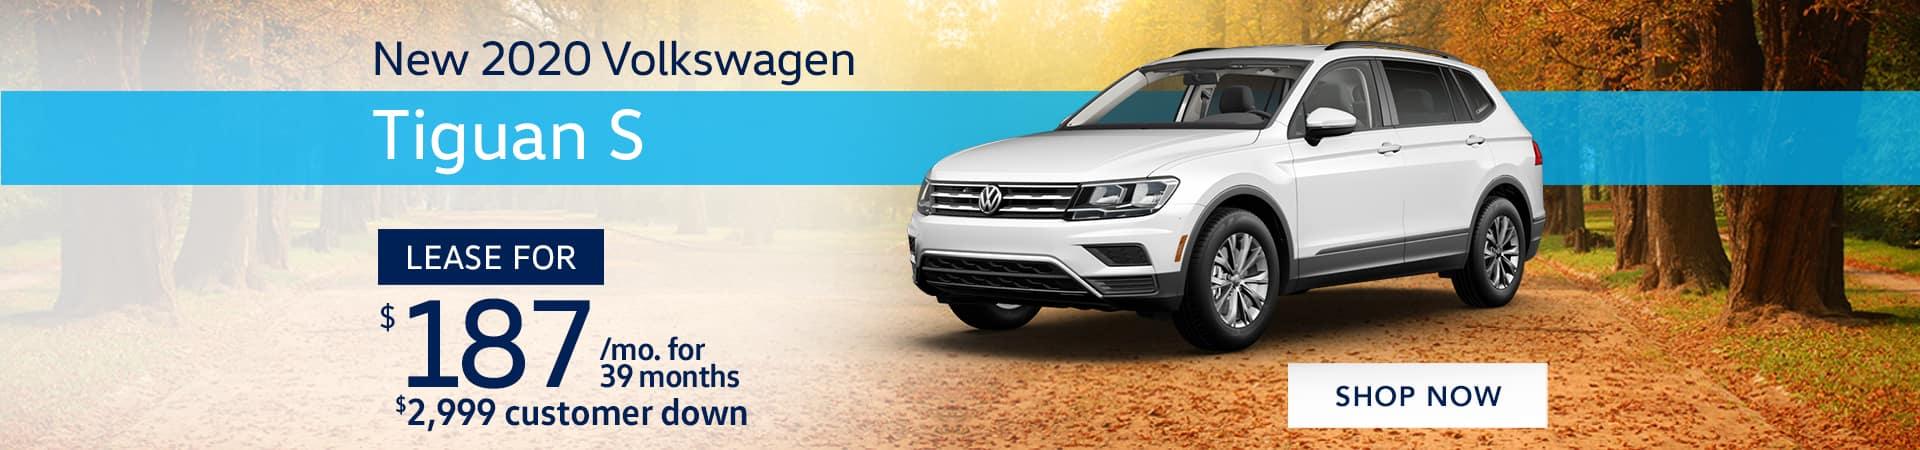 BVW_1920x450_New 2020 Volkswagen TiguanS _09_20